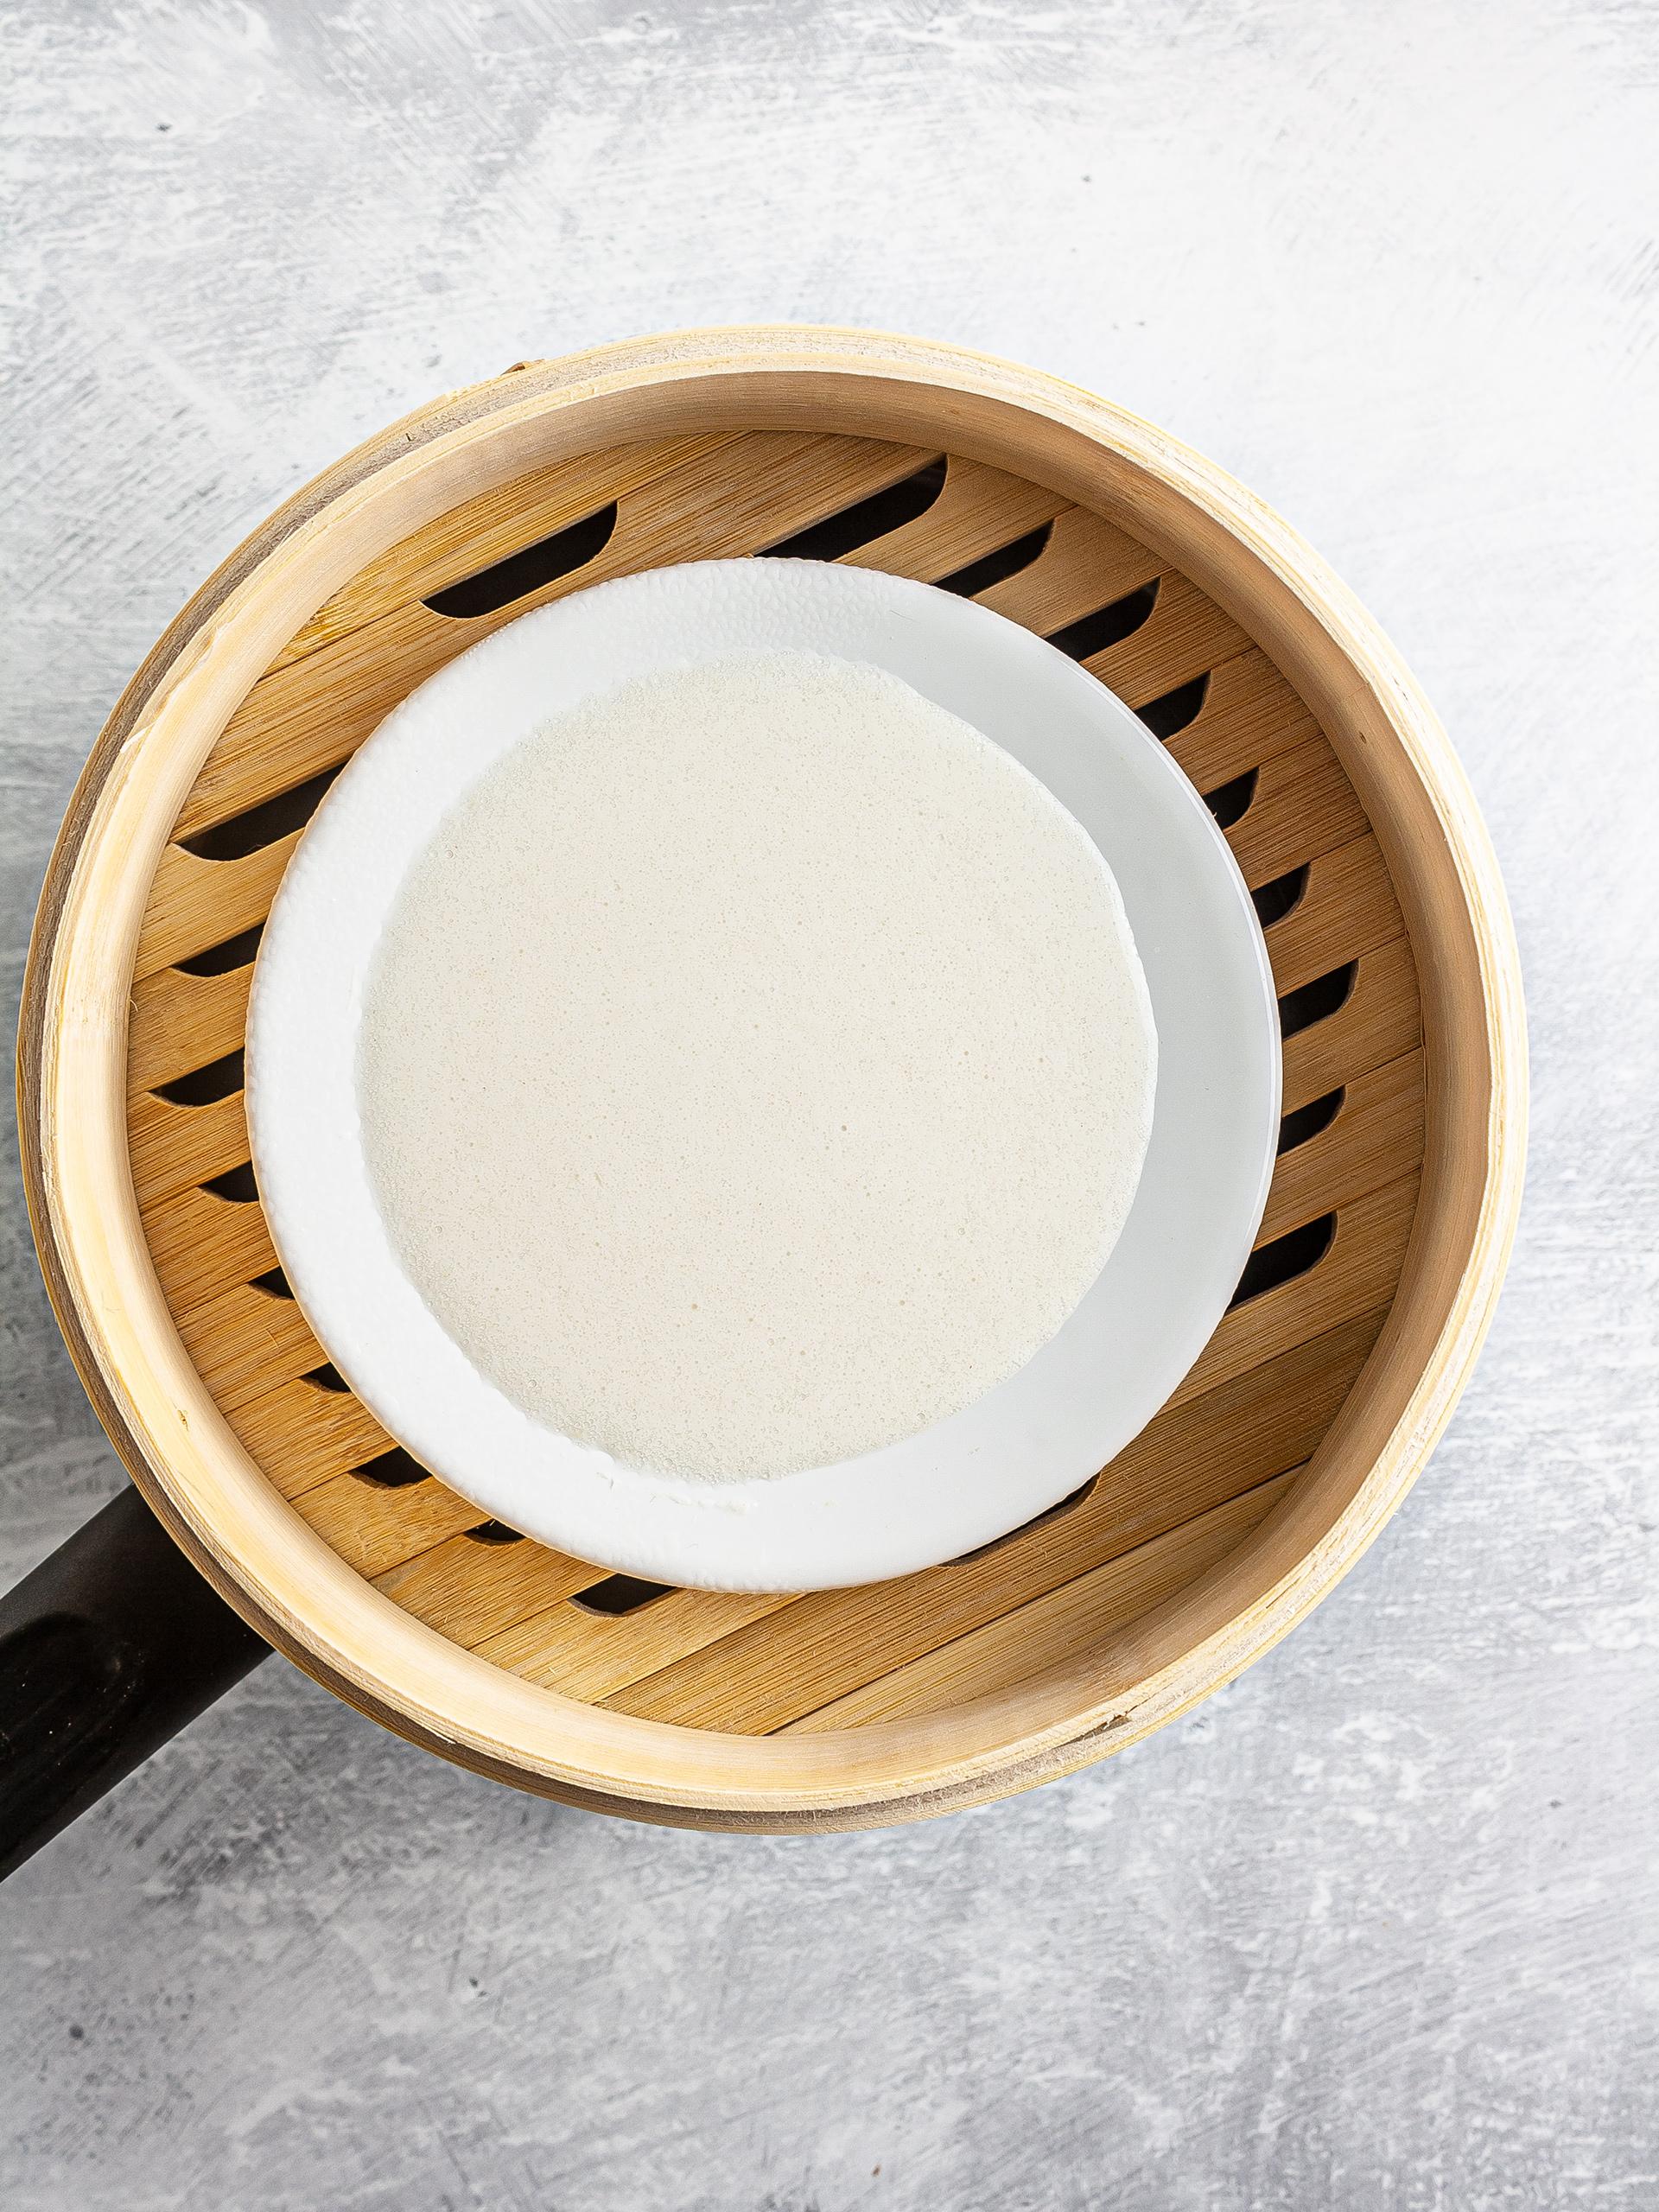 Rice cake batter in the steamer